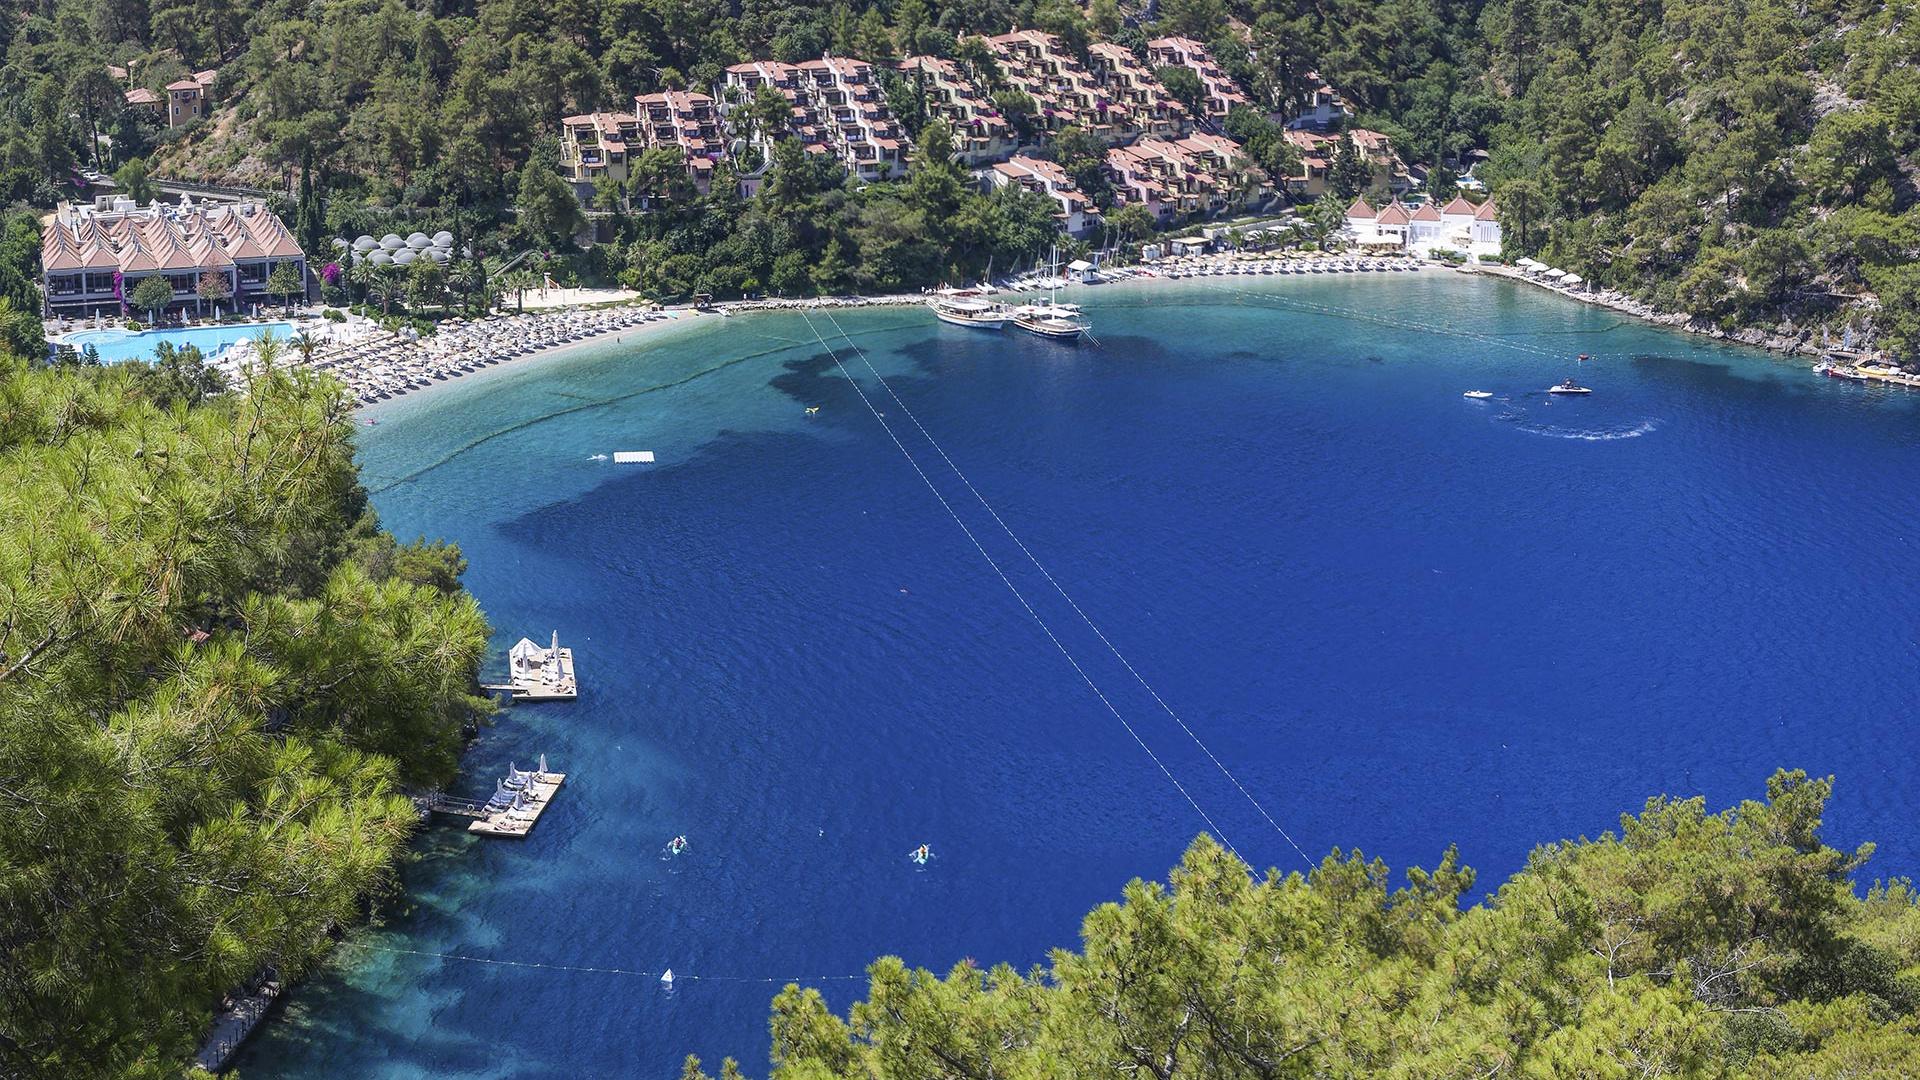 Road to adults-only beach, Hillside Beach Club, Turkey